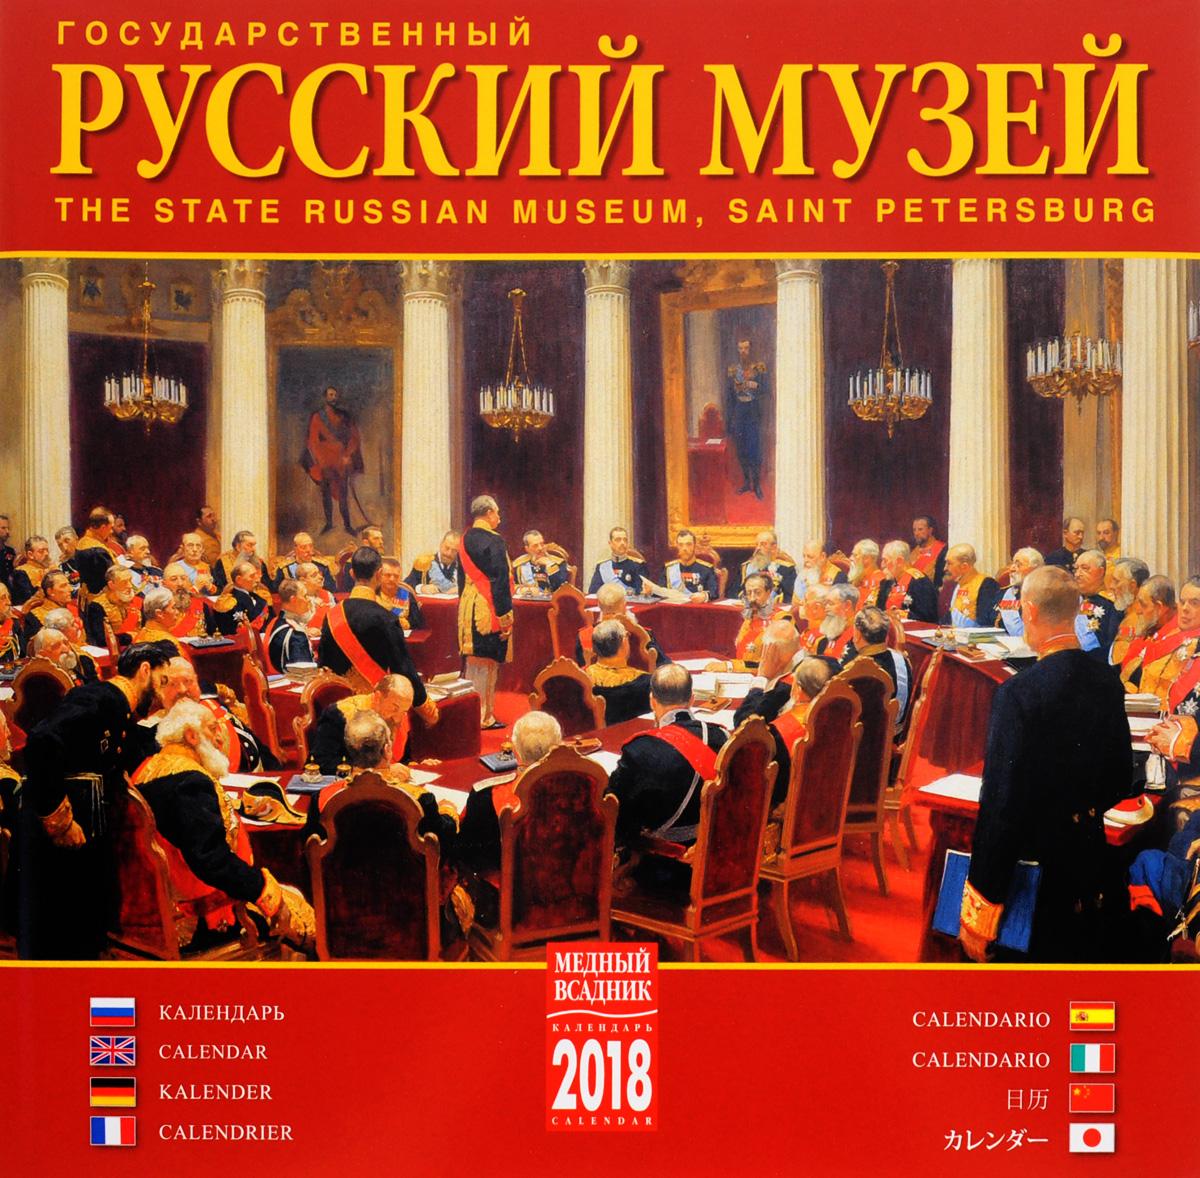 Календарь 2018 год (на скрепке). Государственный Русский музей / The State Russian Museum, Saint Petersburg the state russian museum guide